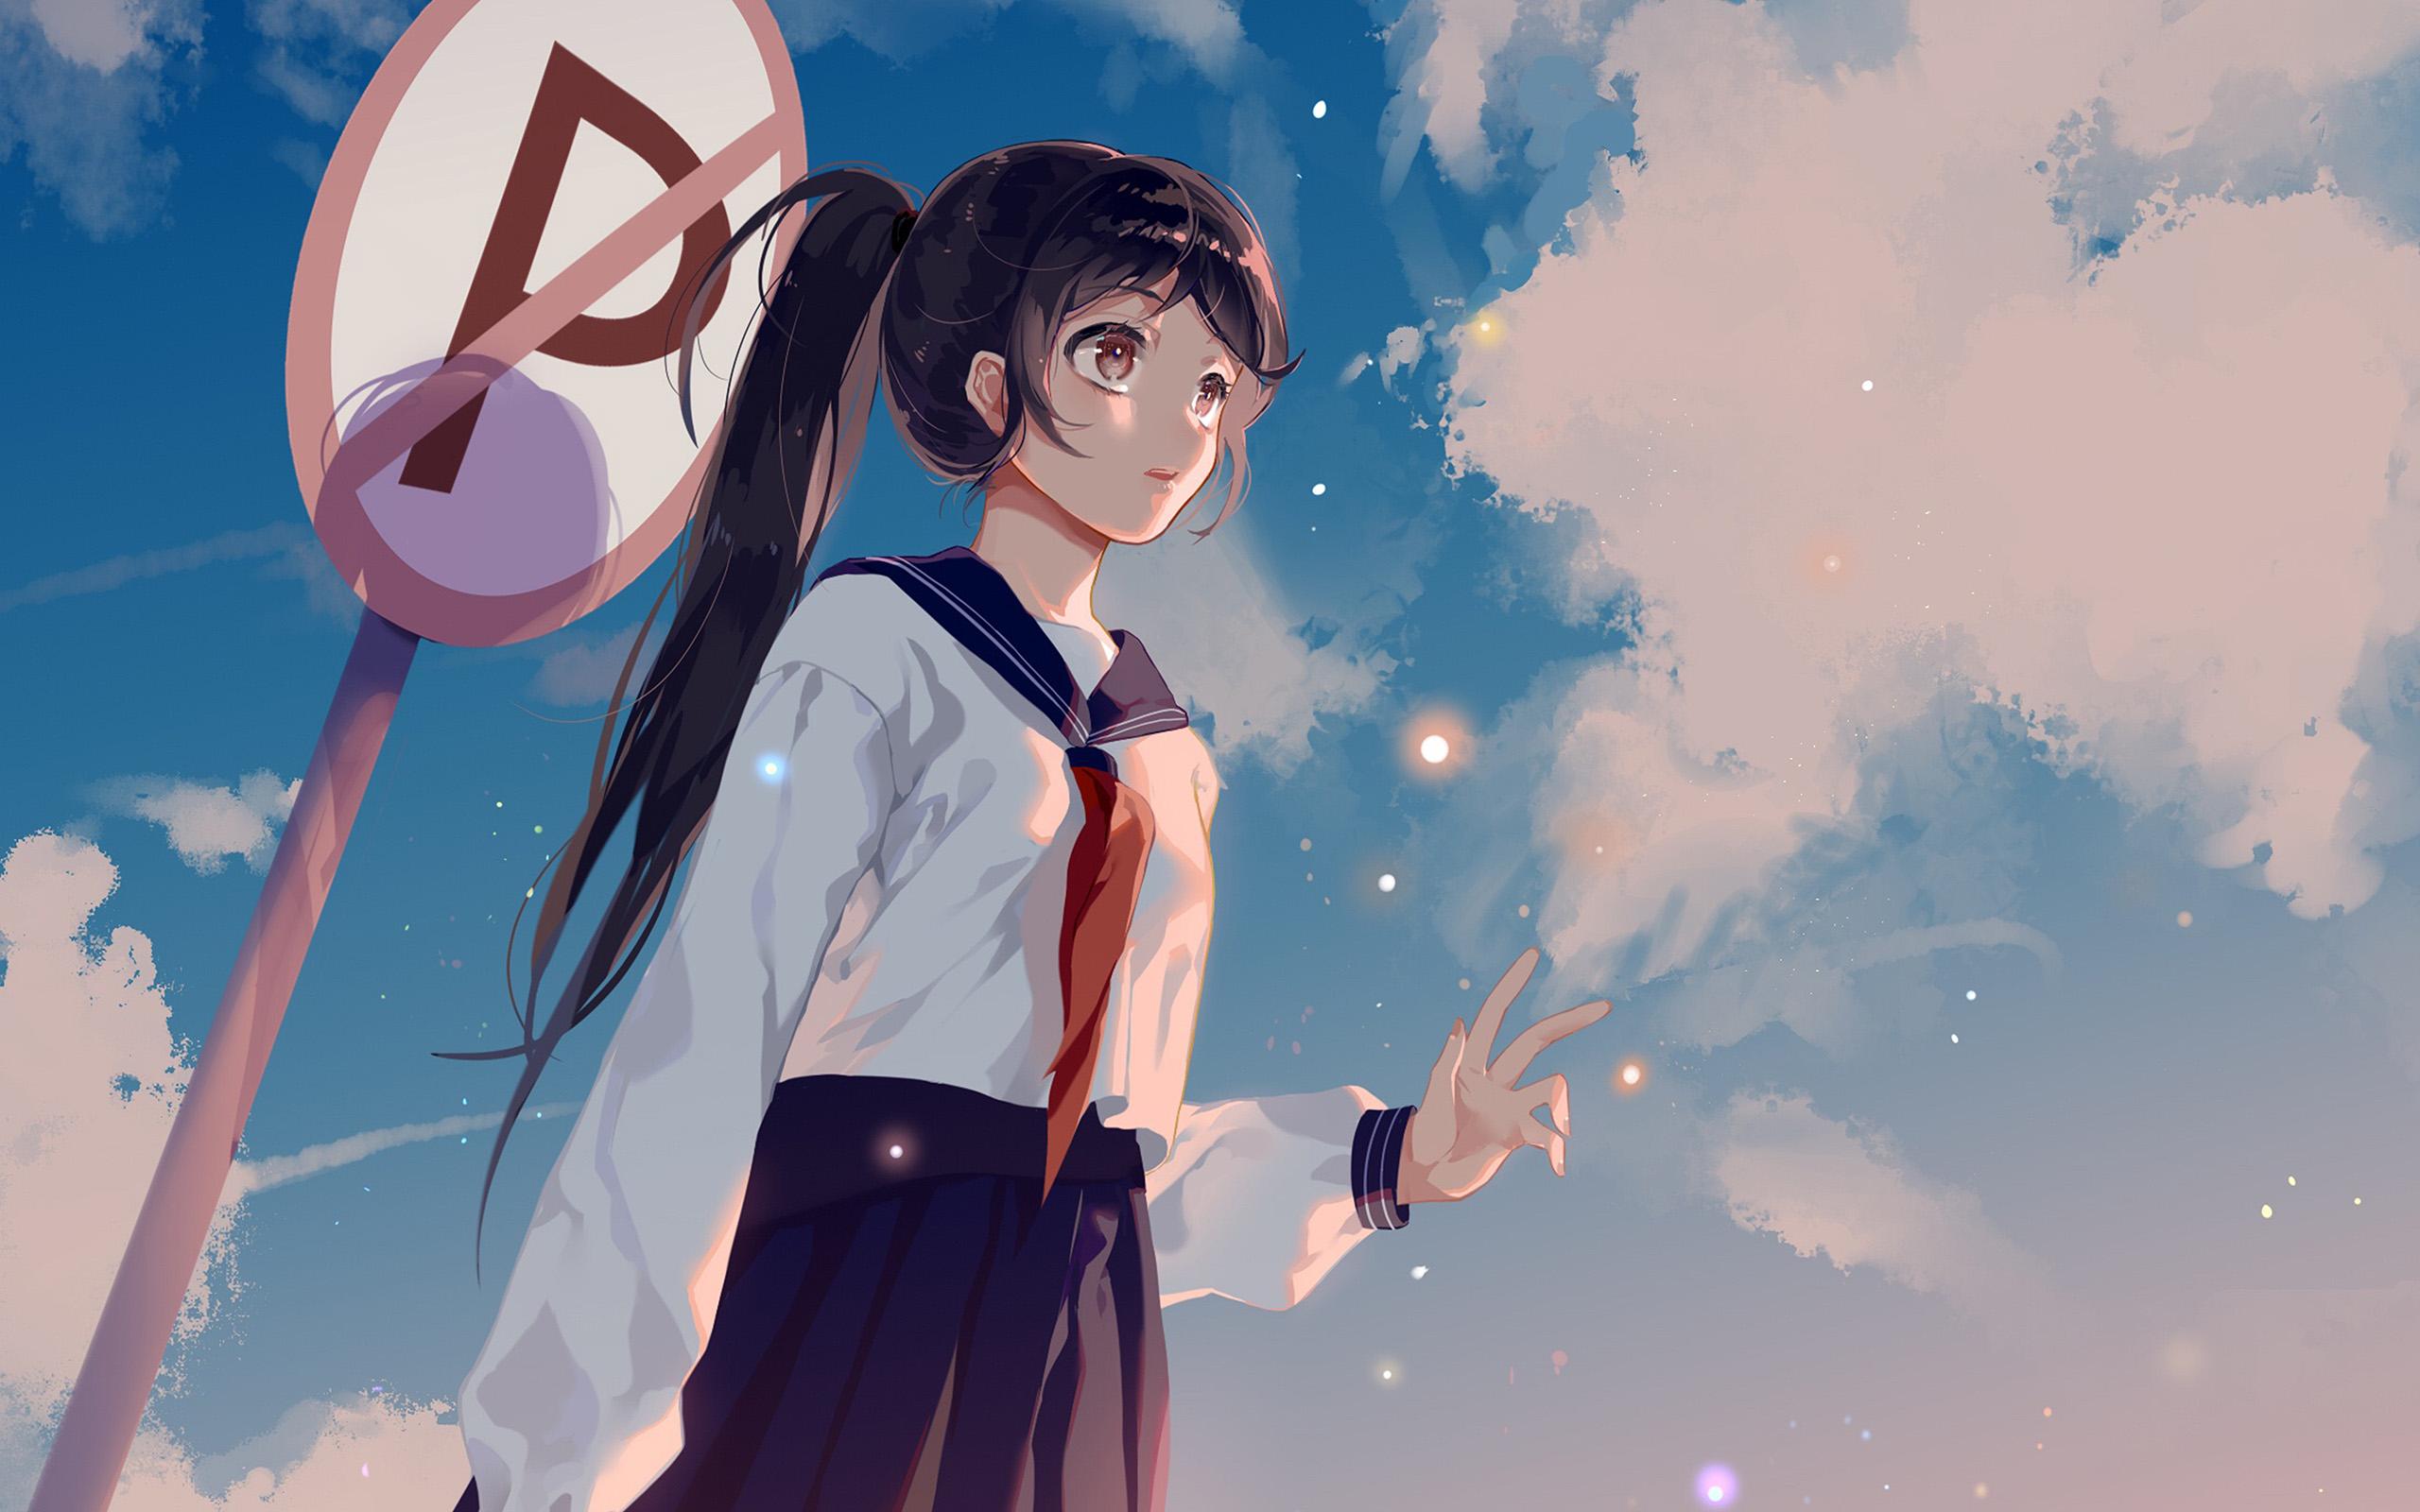 Phone Wallpaper Boy And Girl Sunset Anime Bc66 Girl School Girl Anime Sky Cloud Star Art